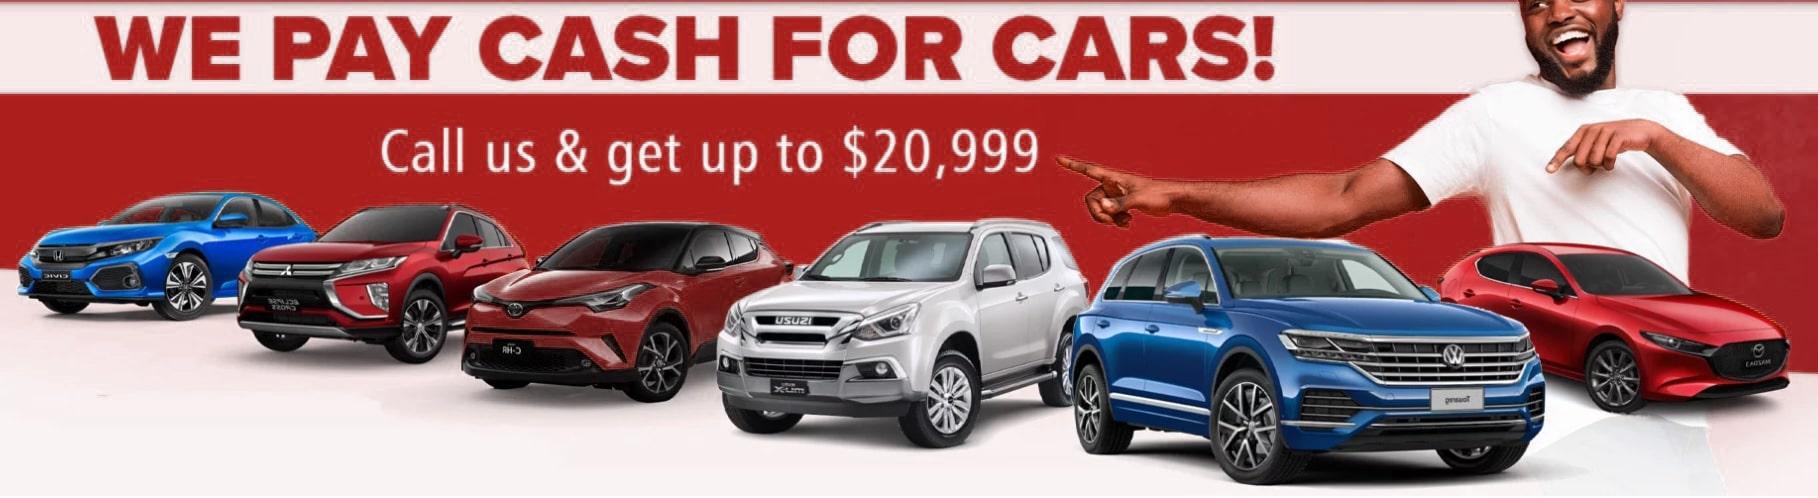 Cash for Cars Devon Meadows